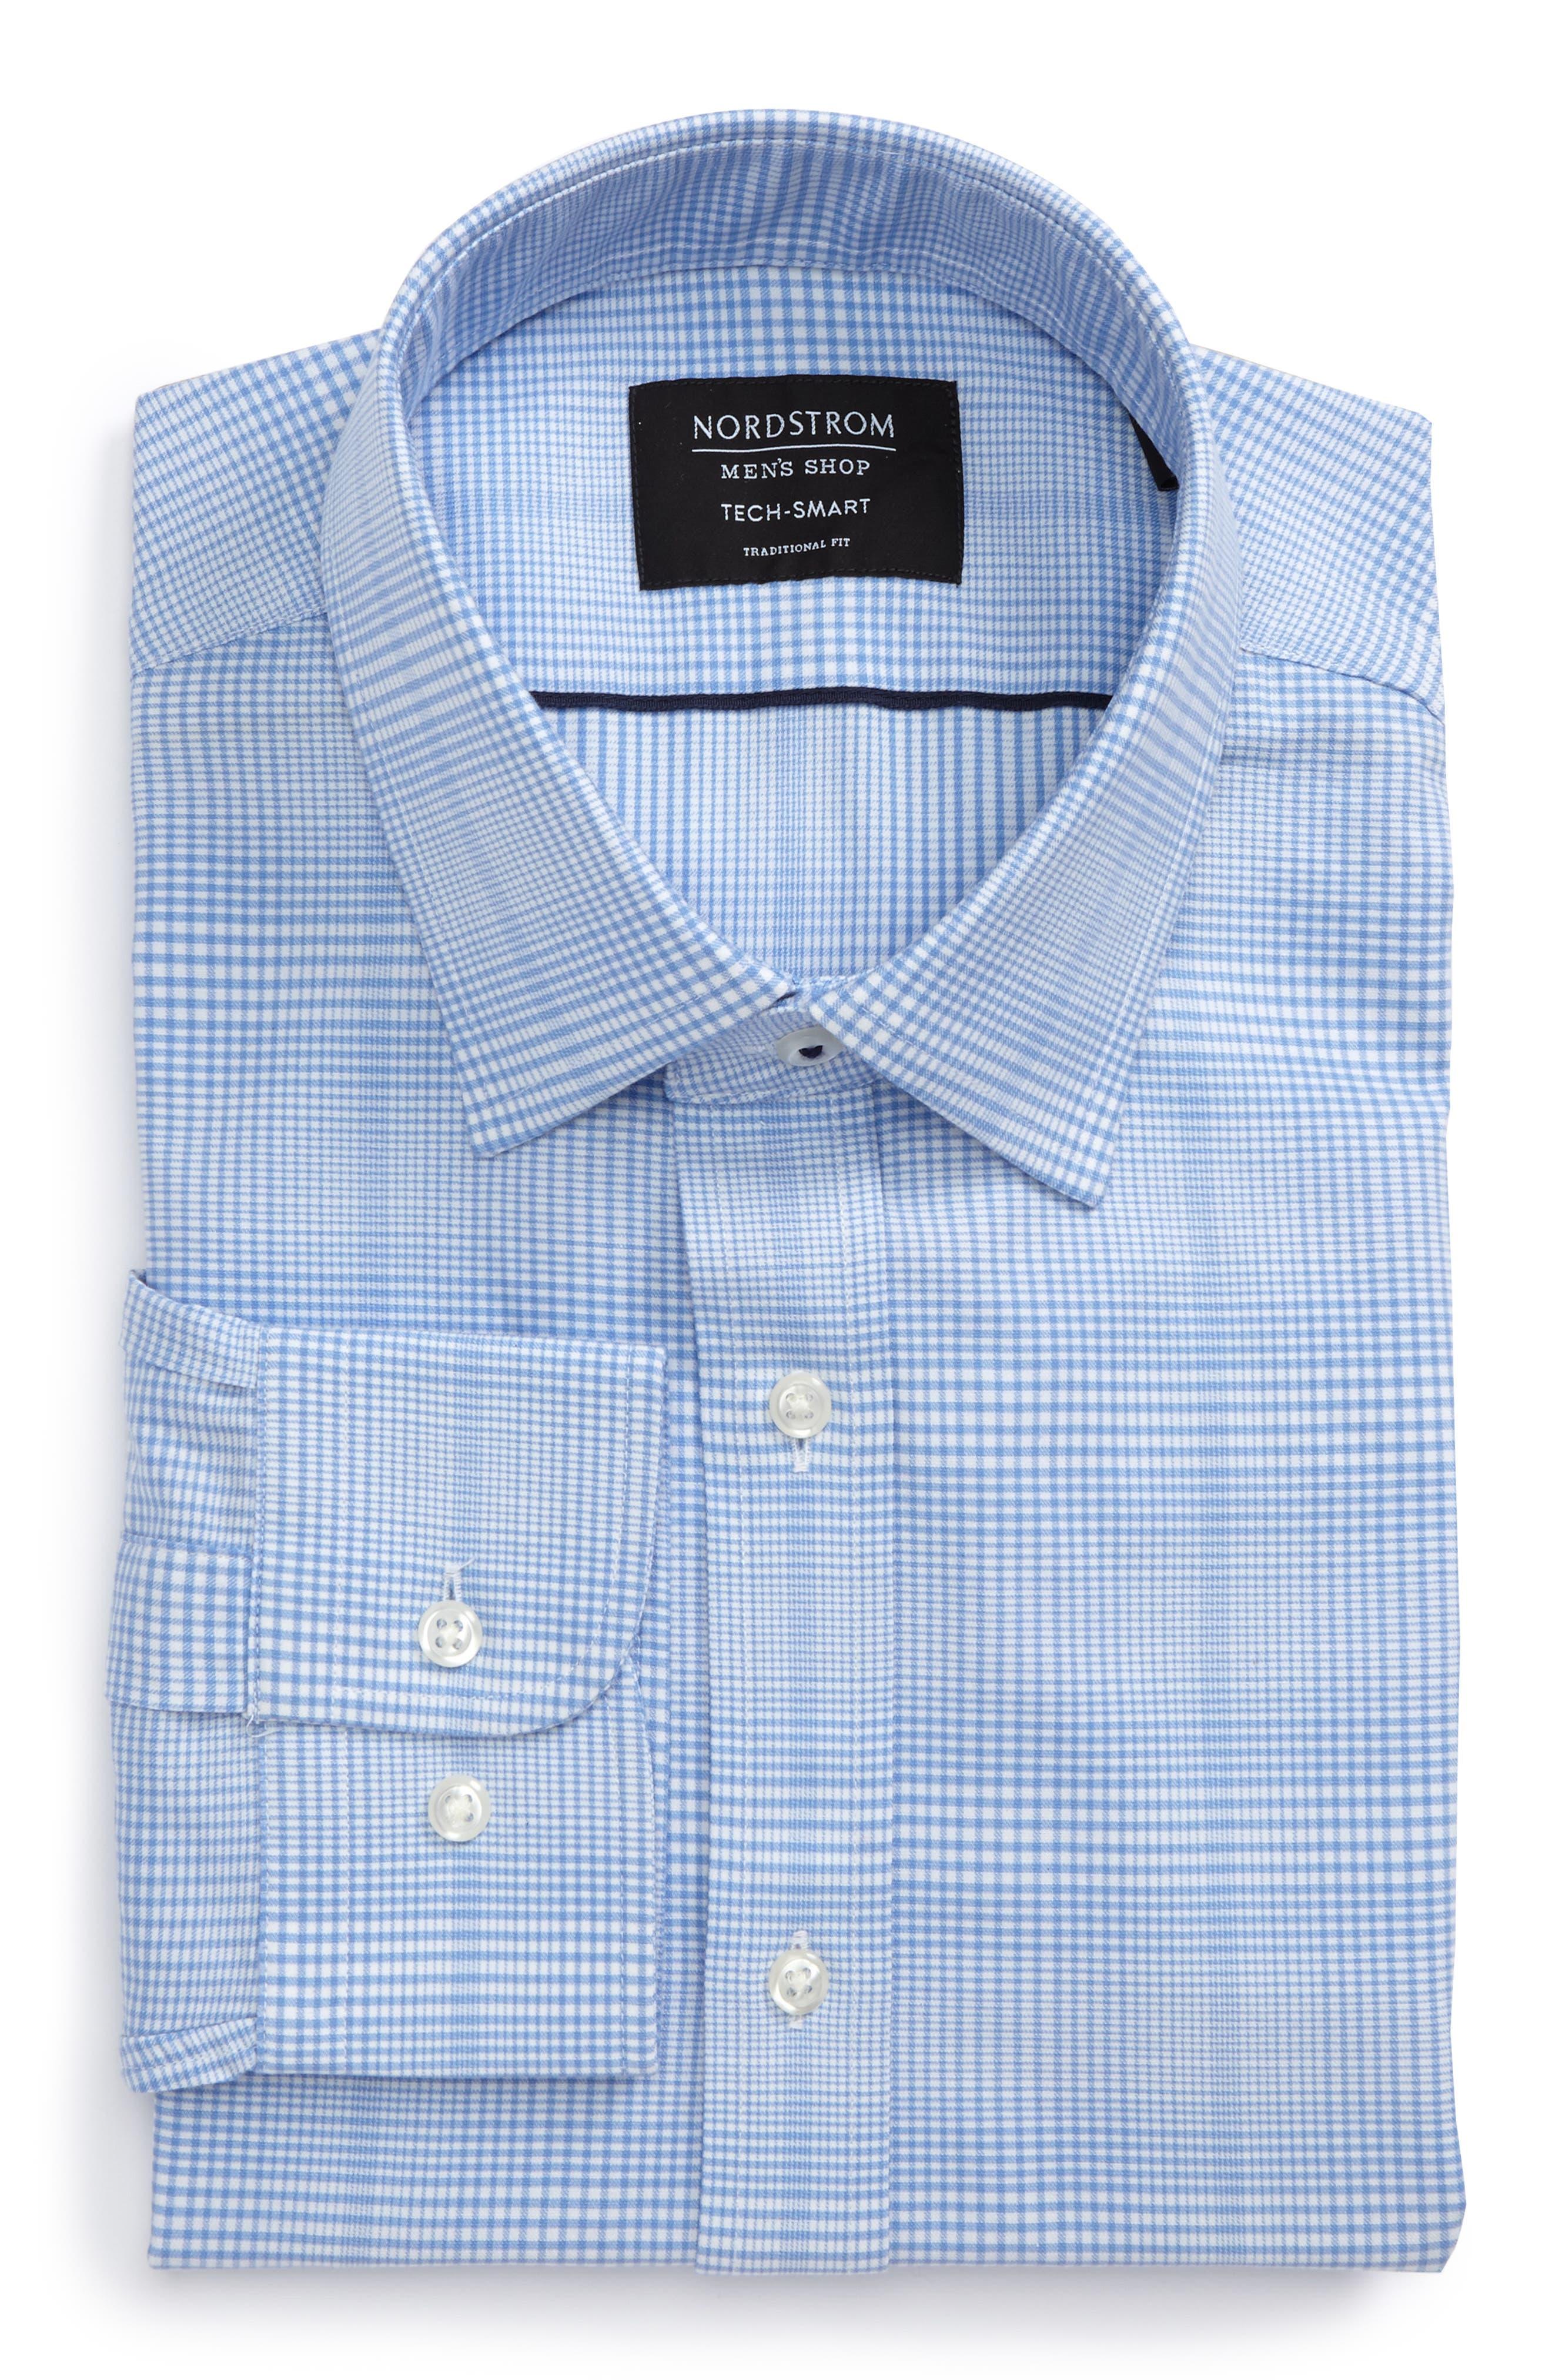 Nordstrom Men's Shop Tech-Smart Traditional Fit Check Dress Shirt